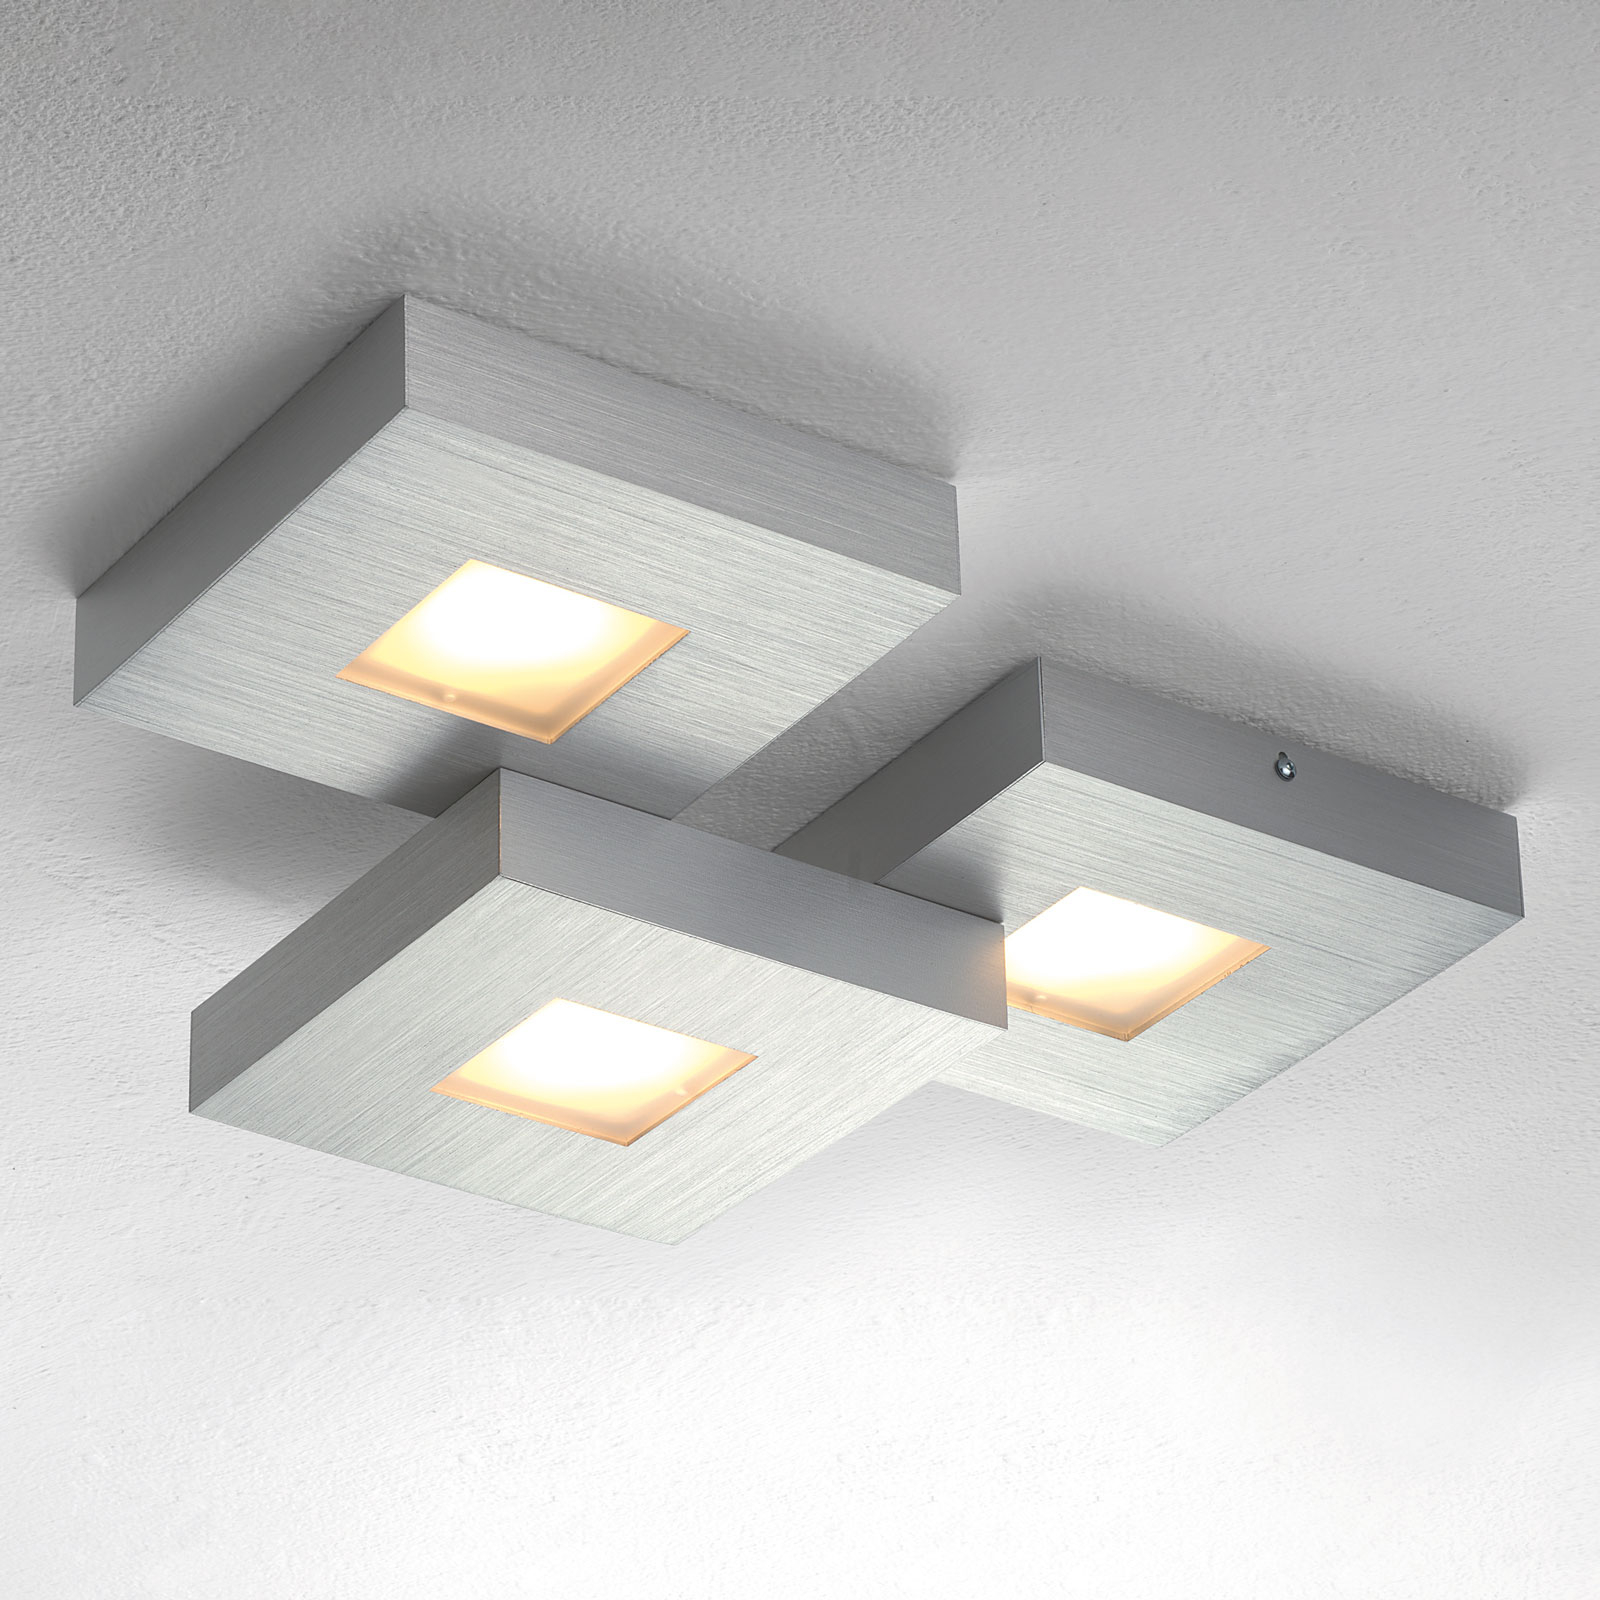 Cubus - plafoniera LED a 3 punti luce